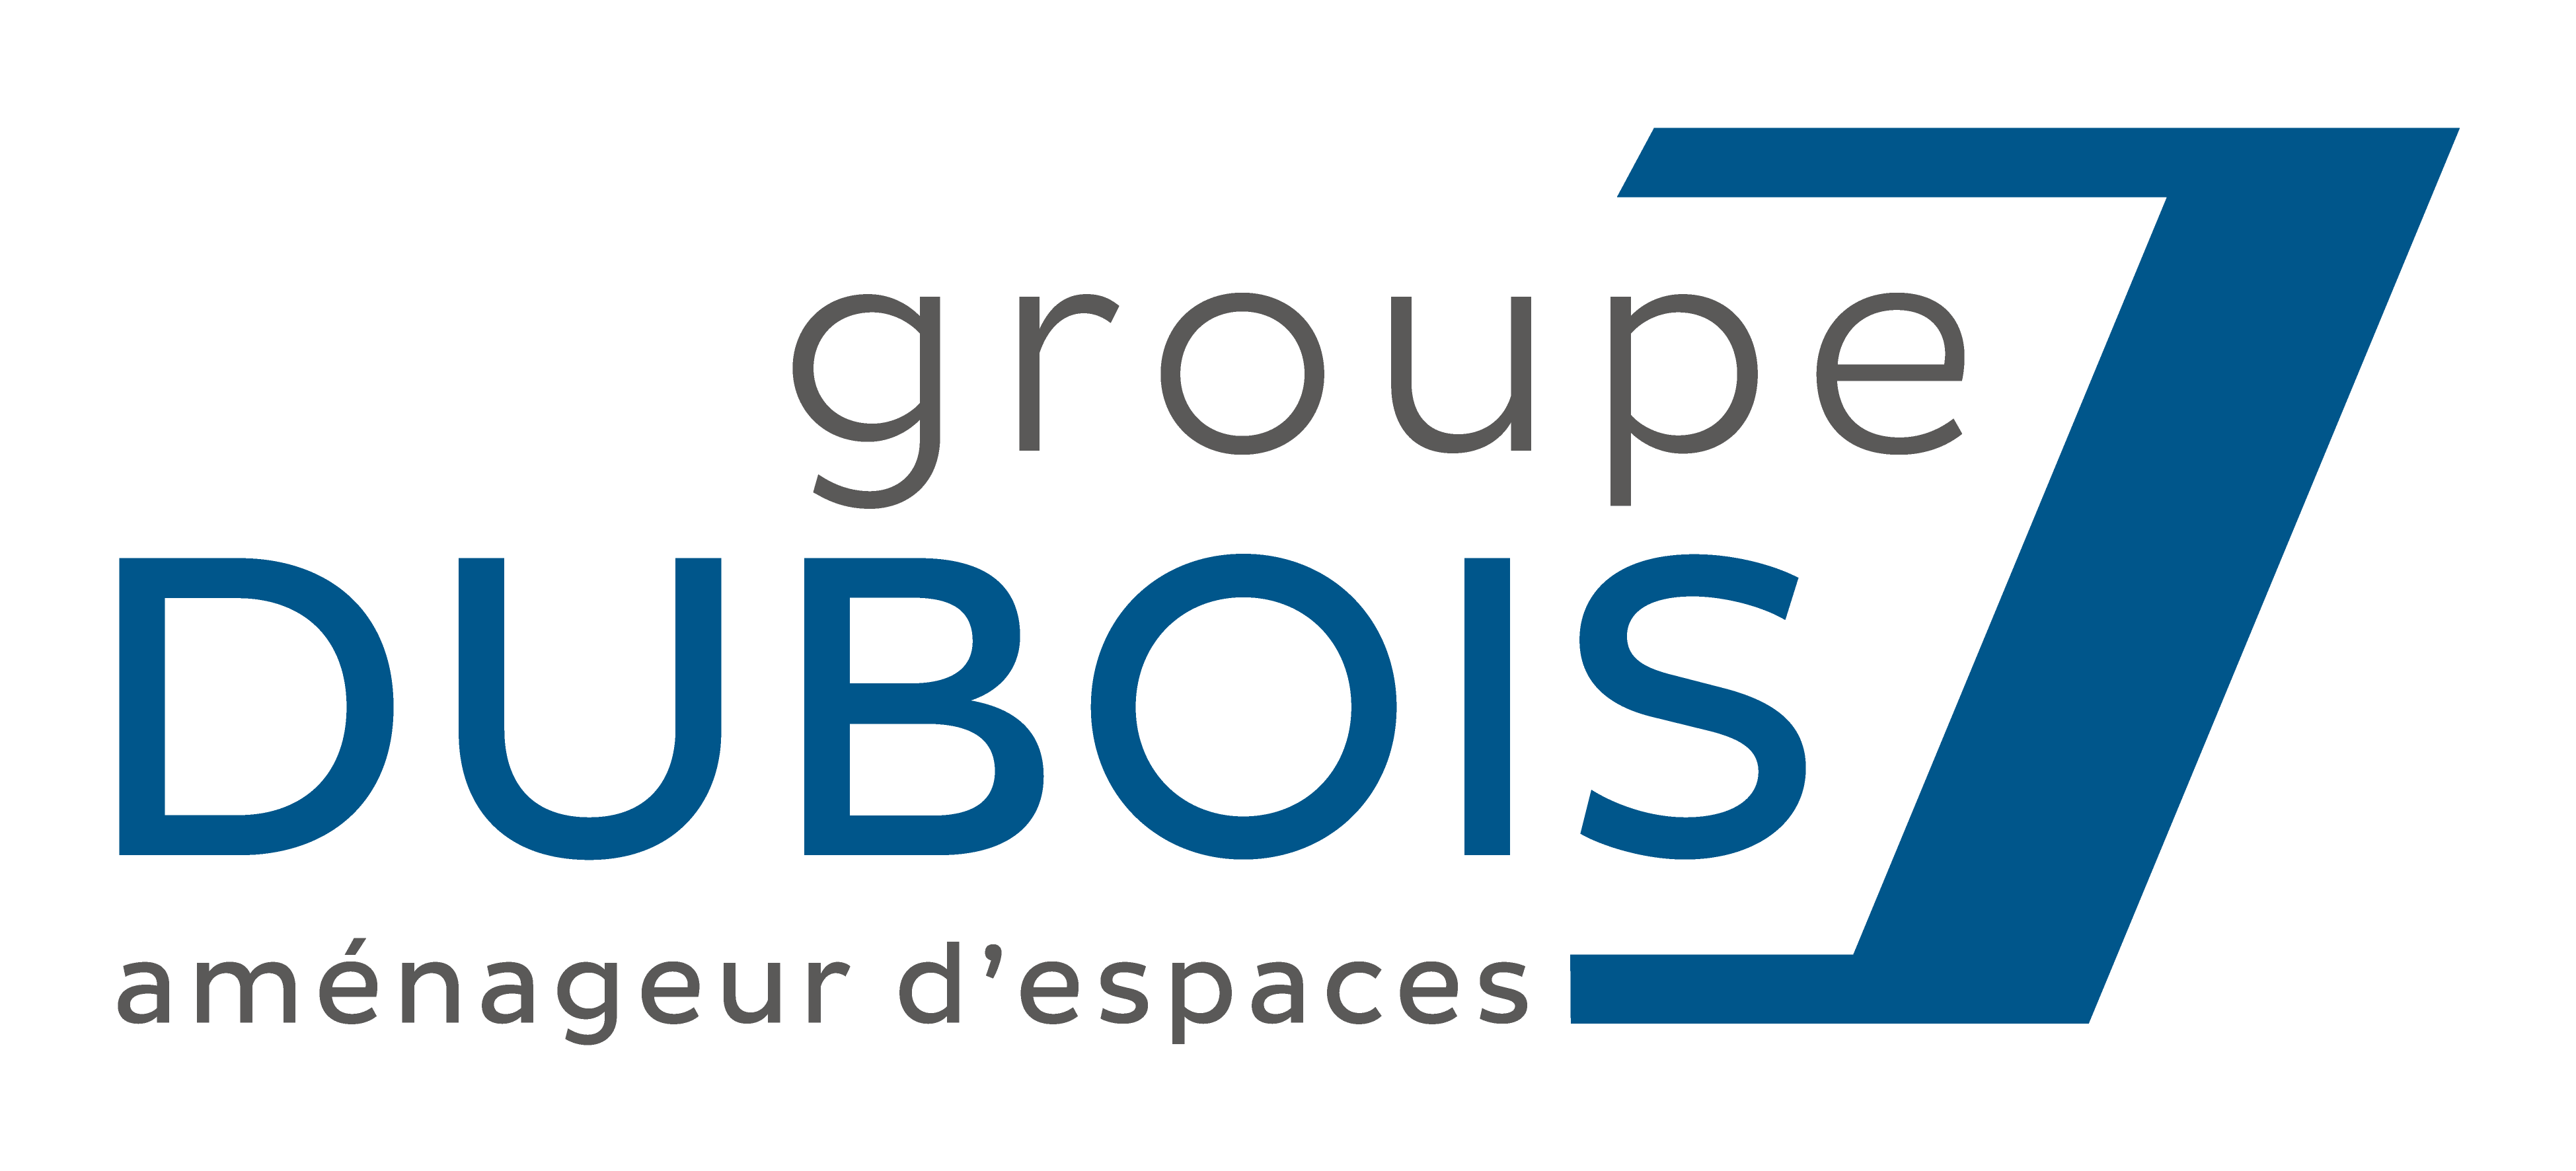 Logo Groupe Dubois Aménageurs d'espaces